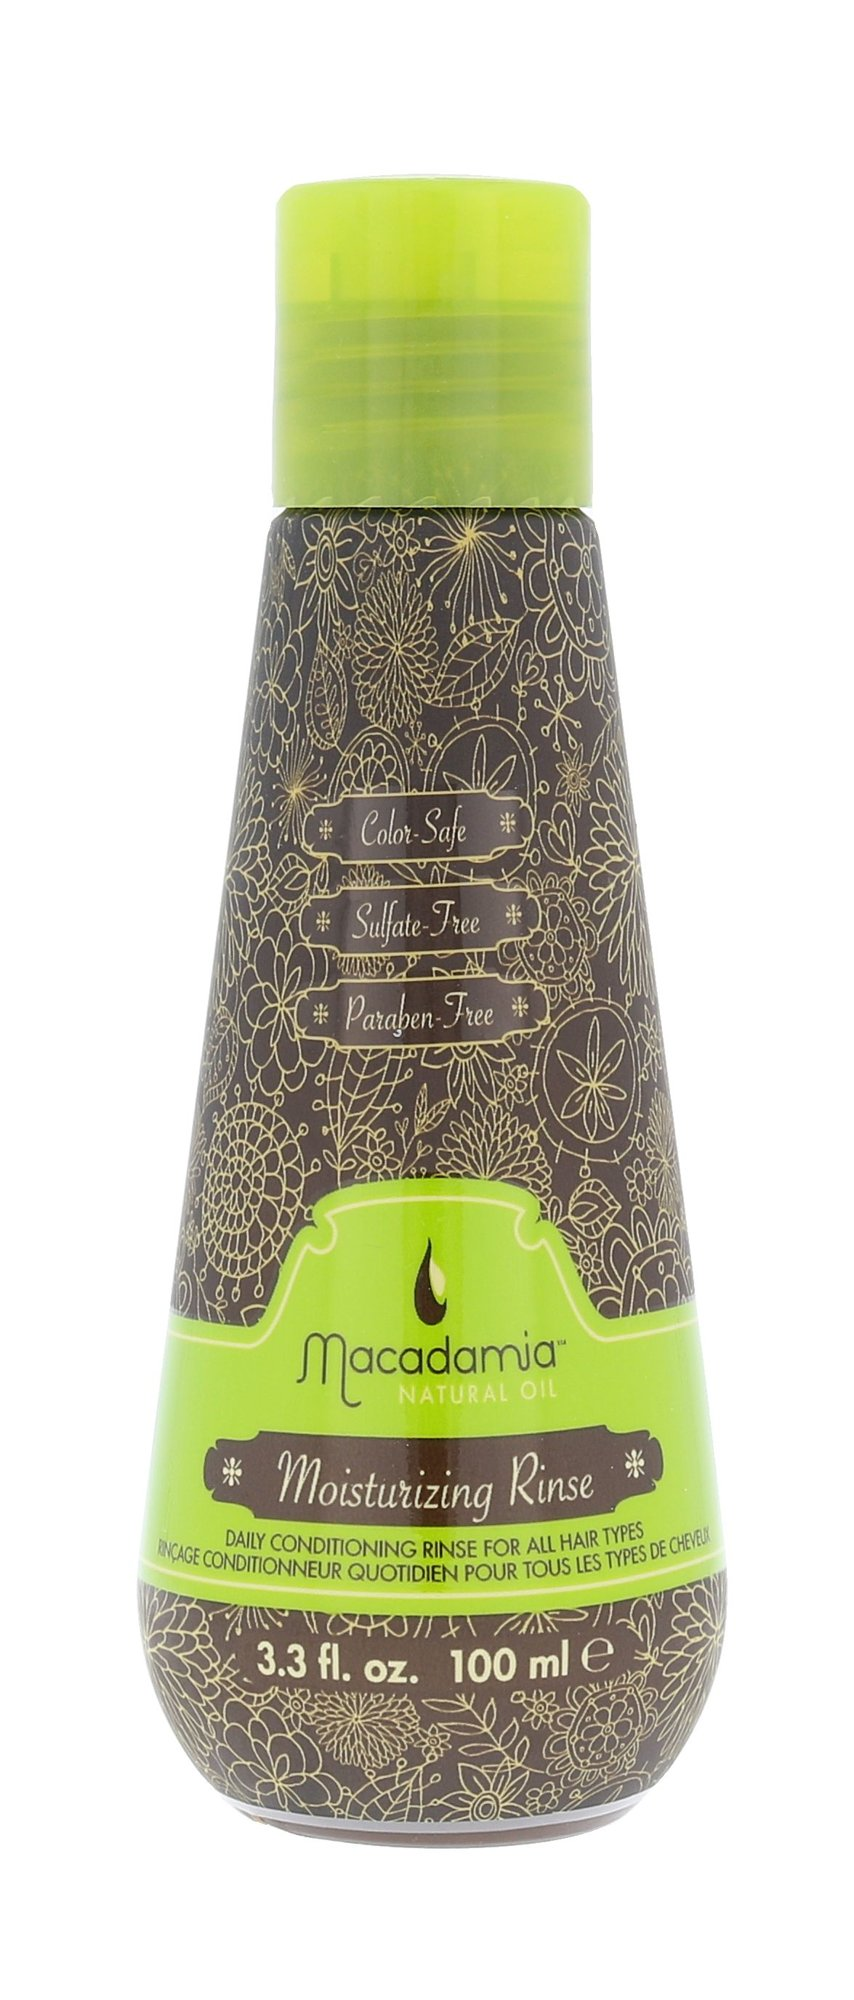 Macadamia Professional Moisturizing Rinse Cosmetic 100ml